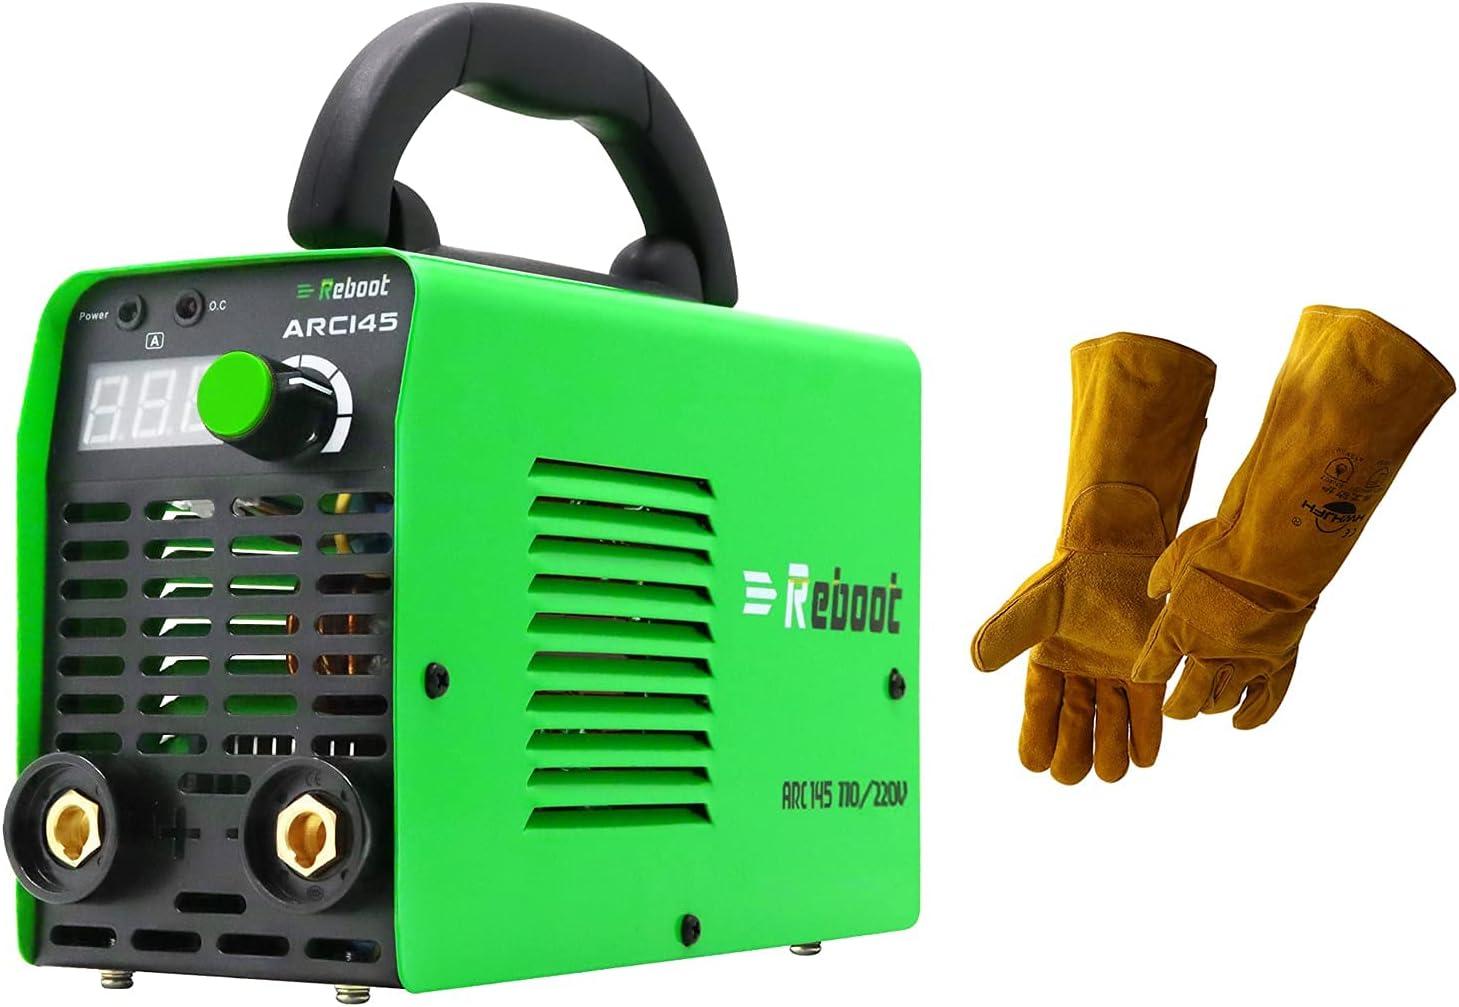 Stick Welder Machine IGBT Inverter ARC D Reboot Discount mail order ARC145 Direct store MMA